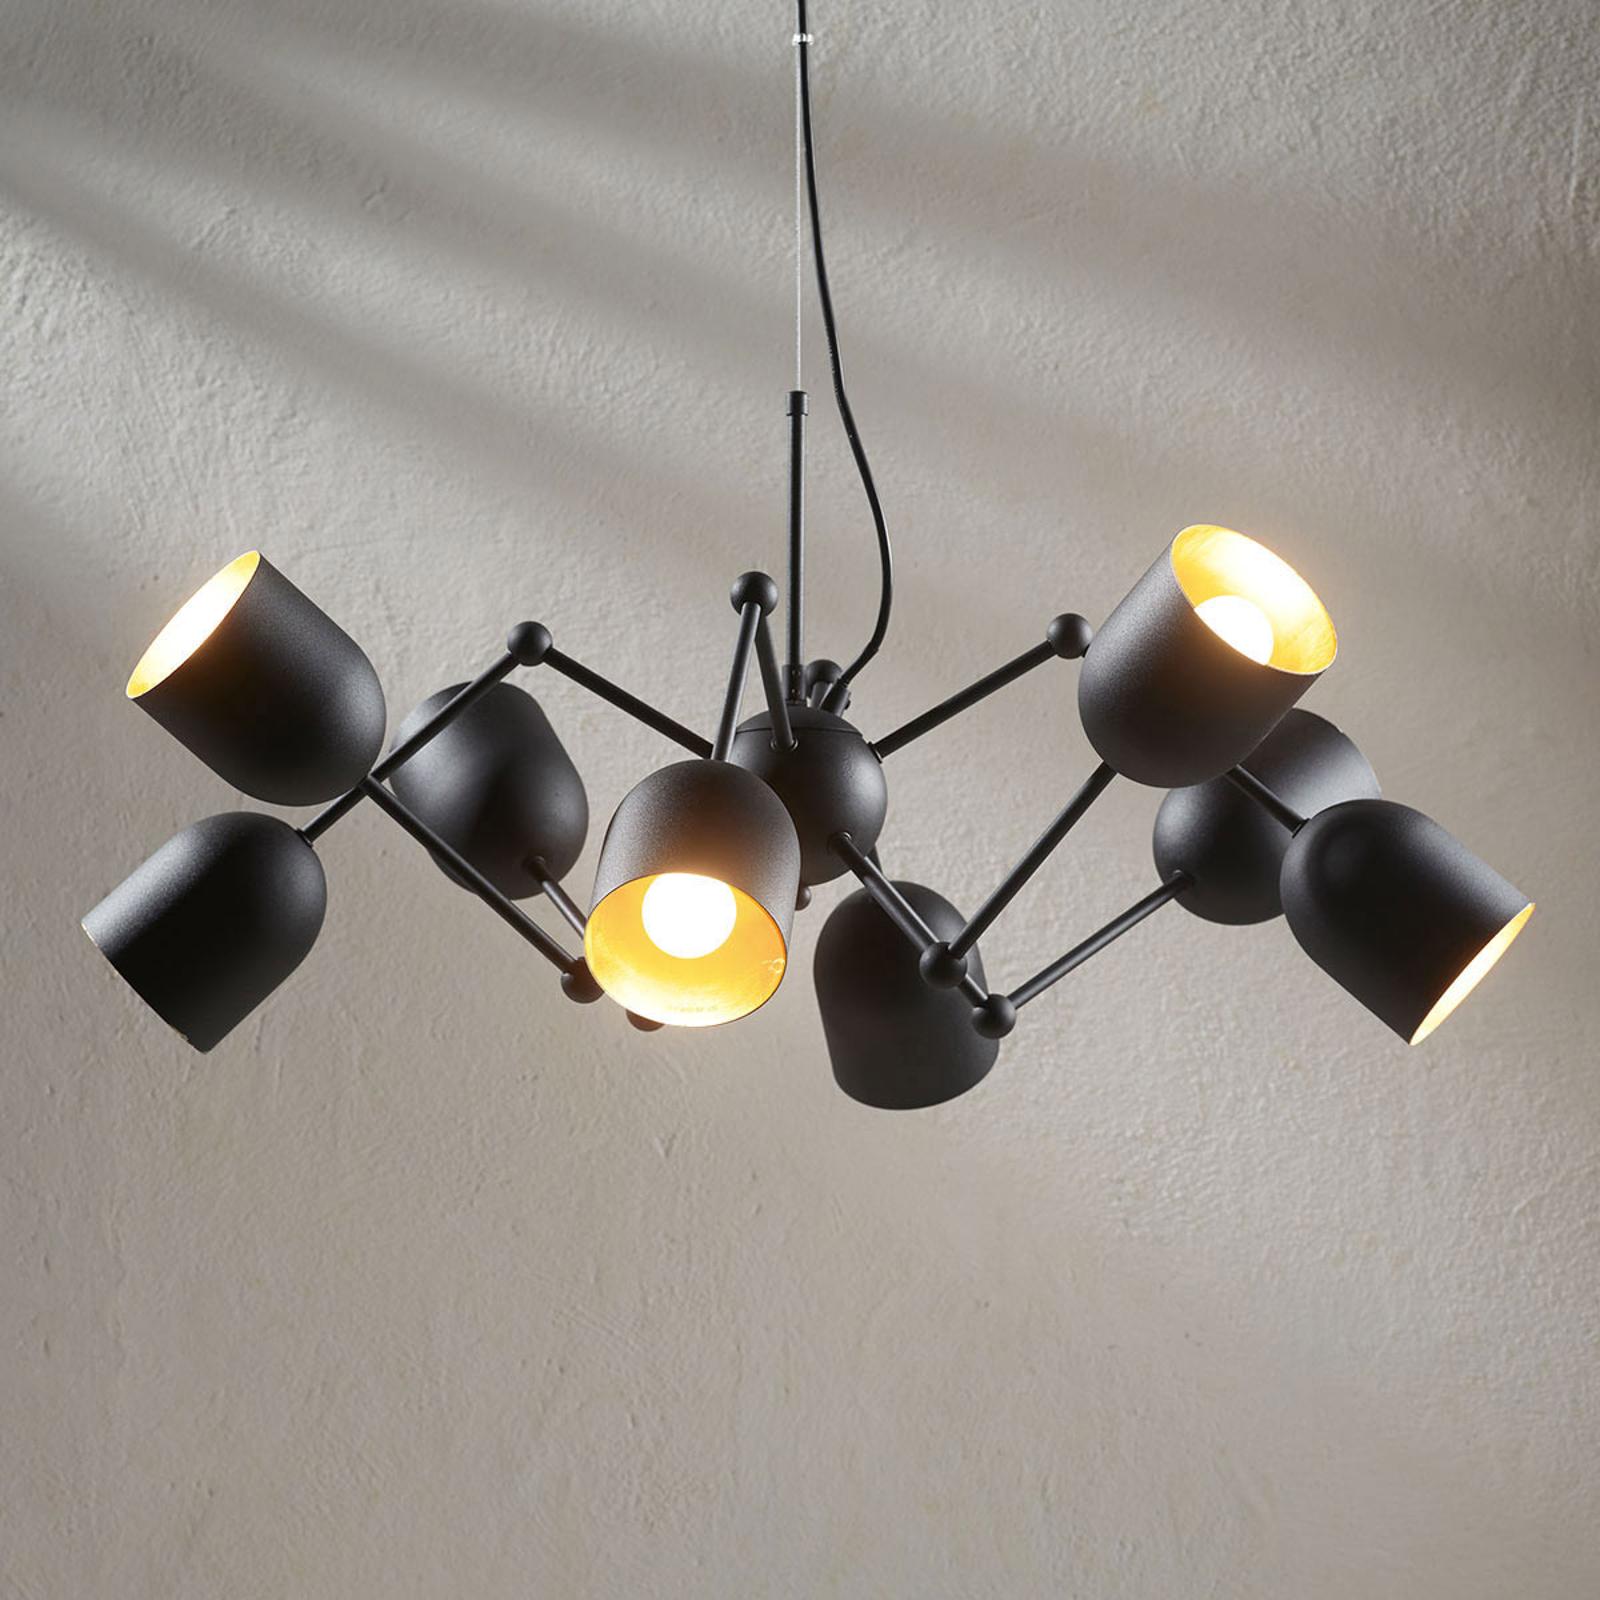 8-punktowa lampa wisząca LED Morik, easydim